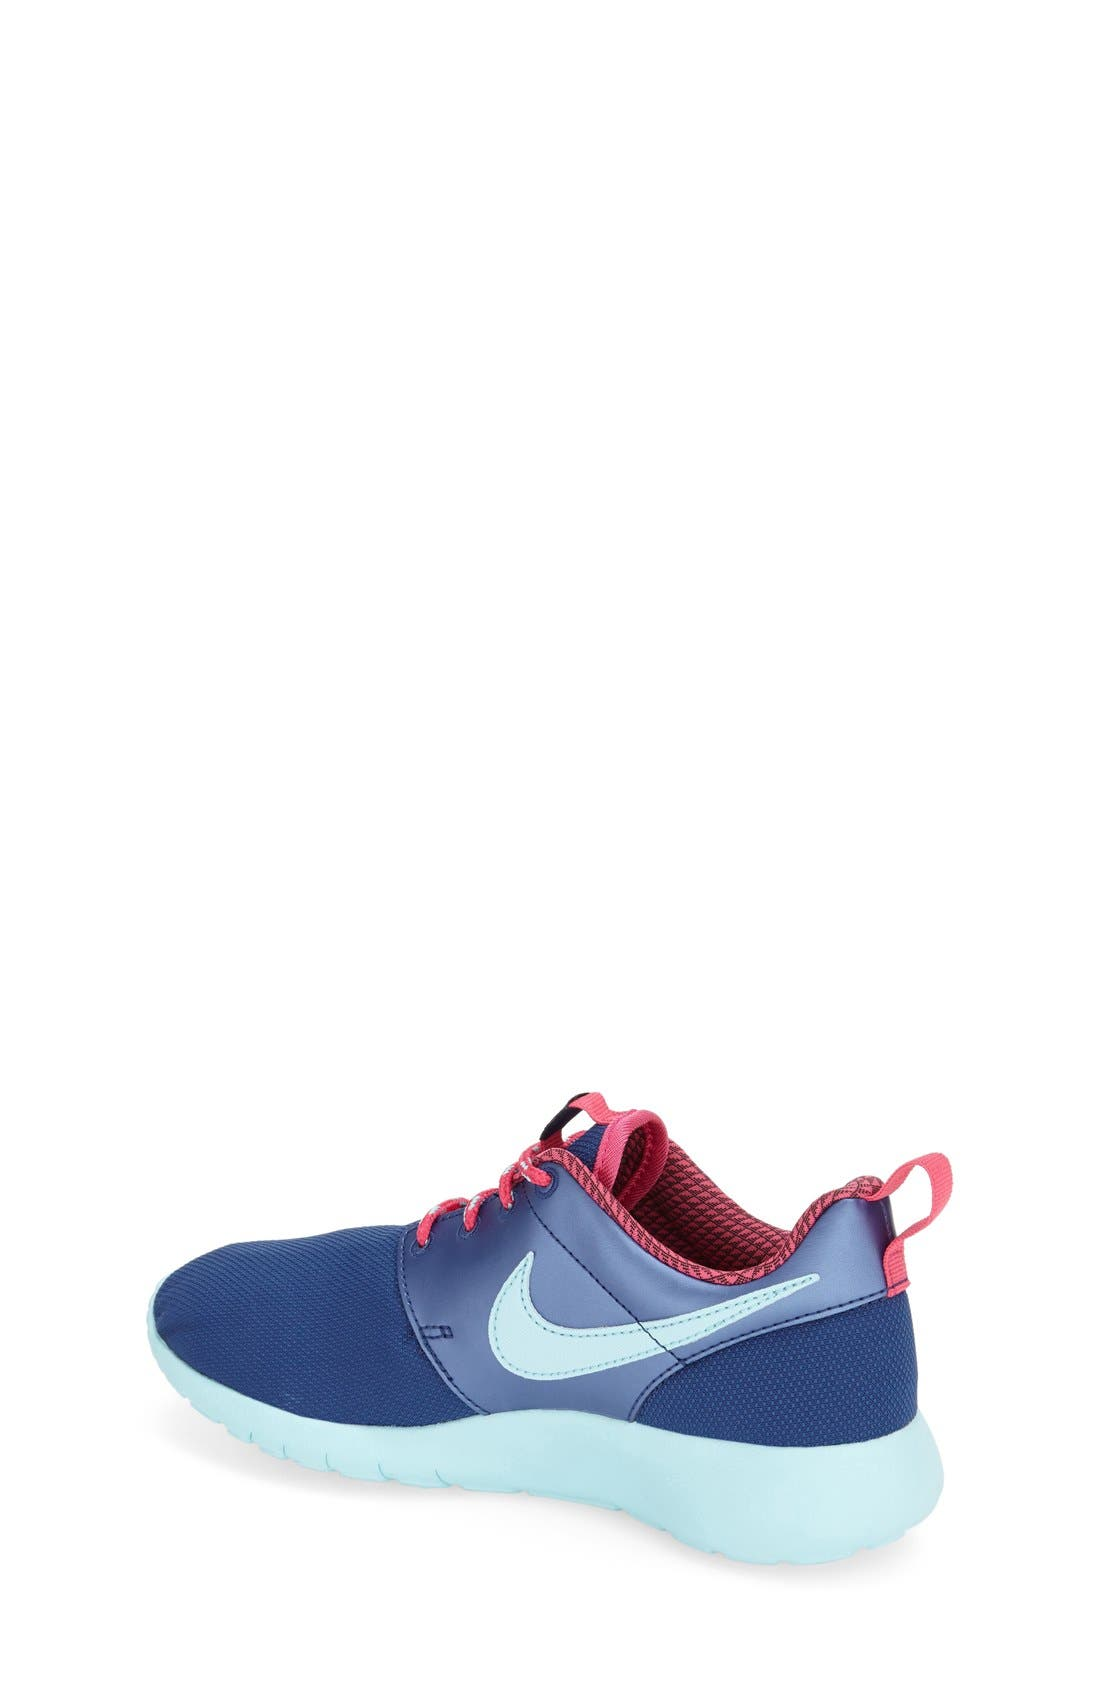 'Roshe Run' Athletic Shoe,                             Alternate thumbnail 90, color,